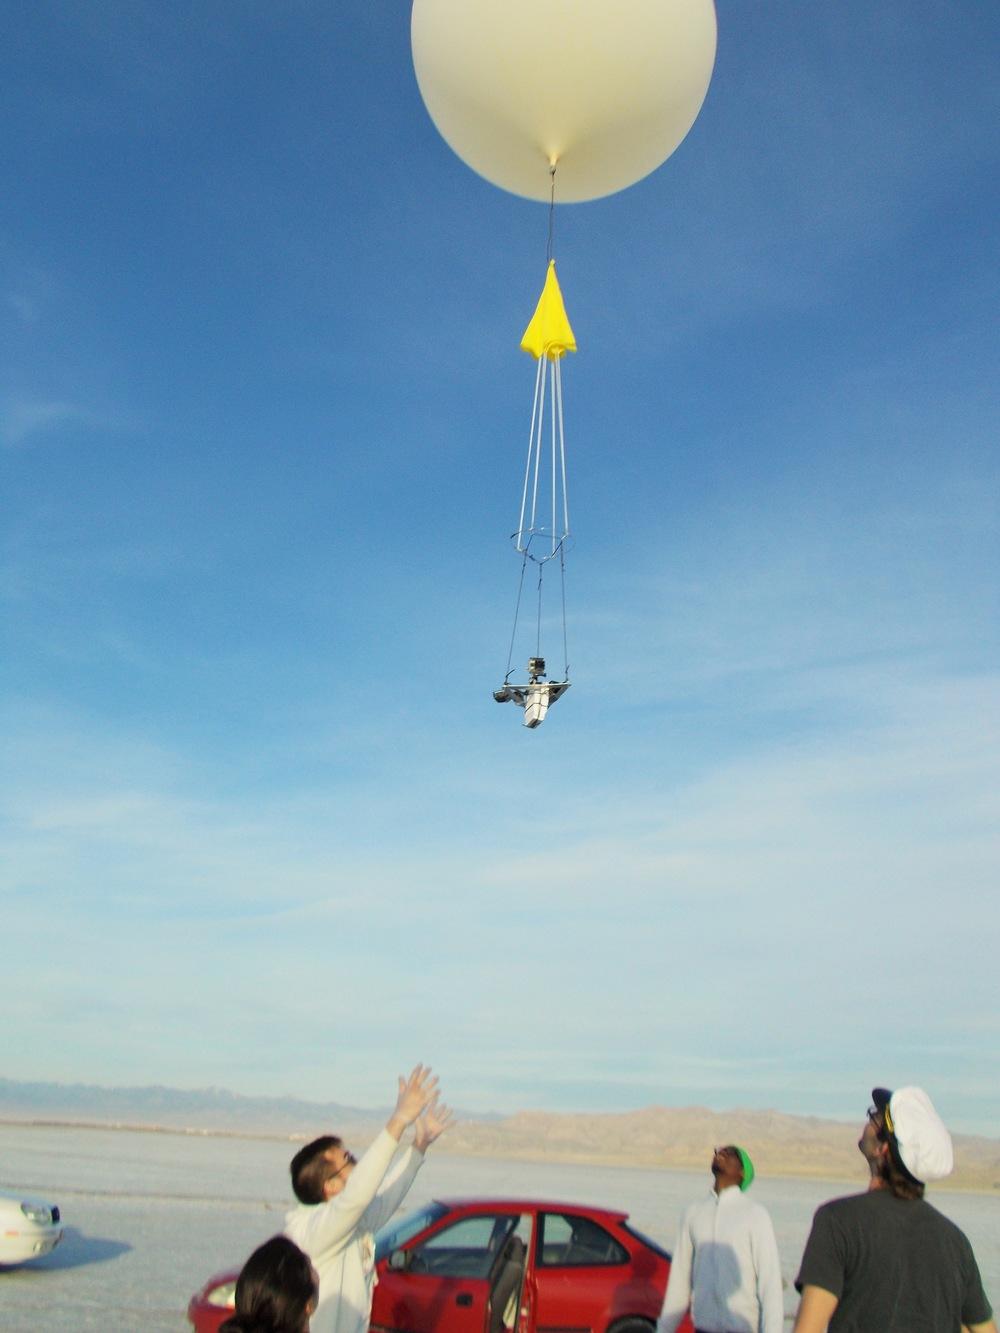 Students for Space Entrepreneurship and Technology - Utah, USA